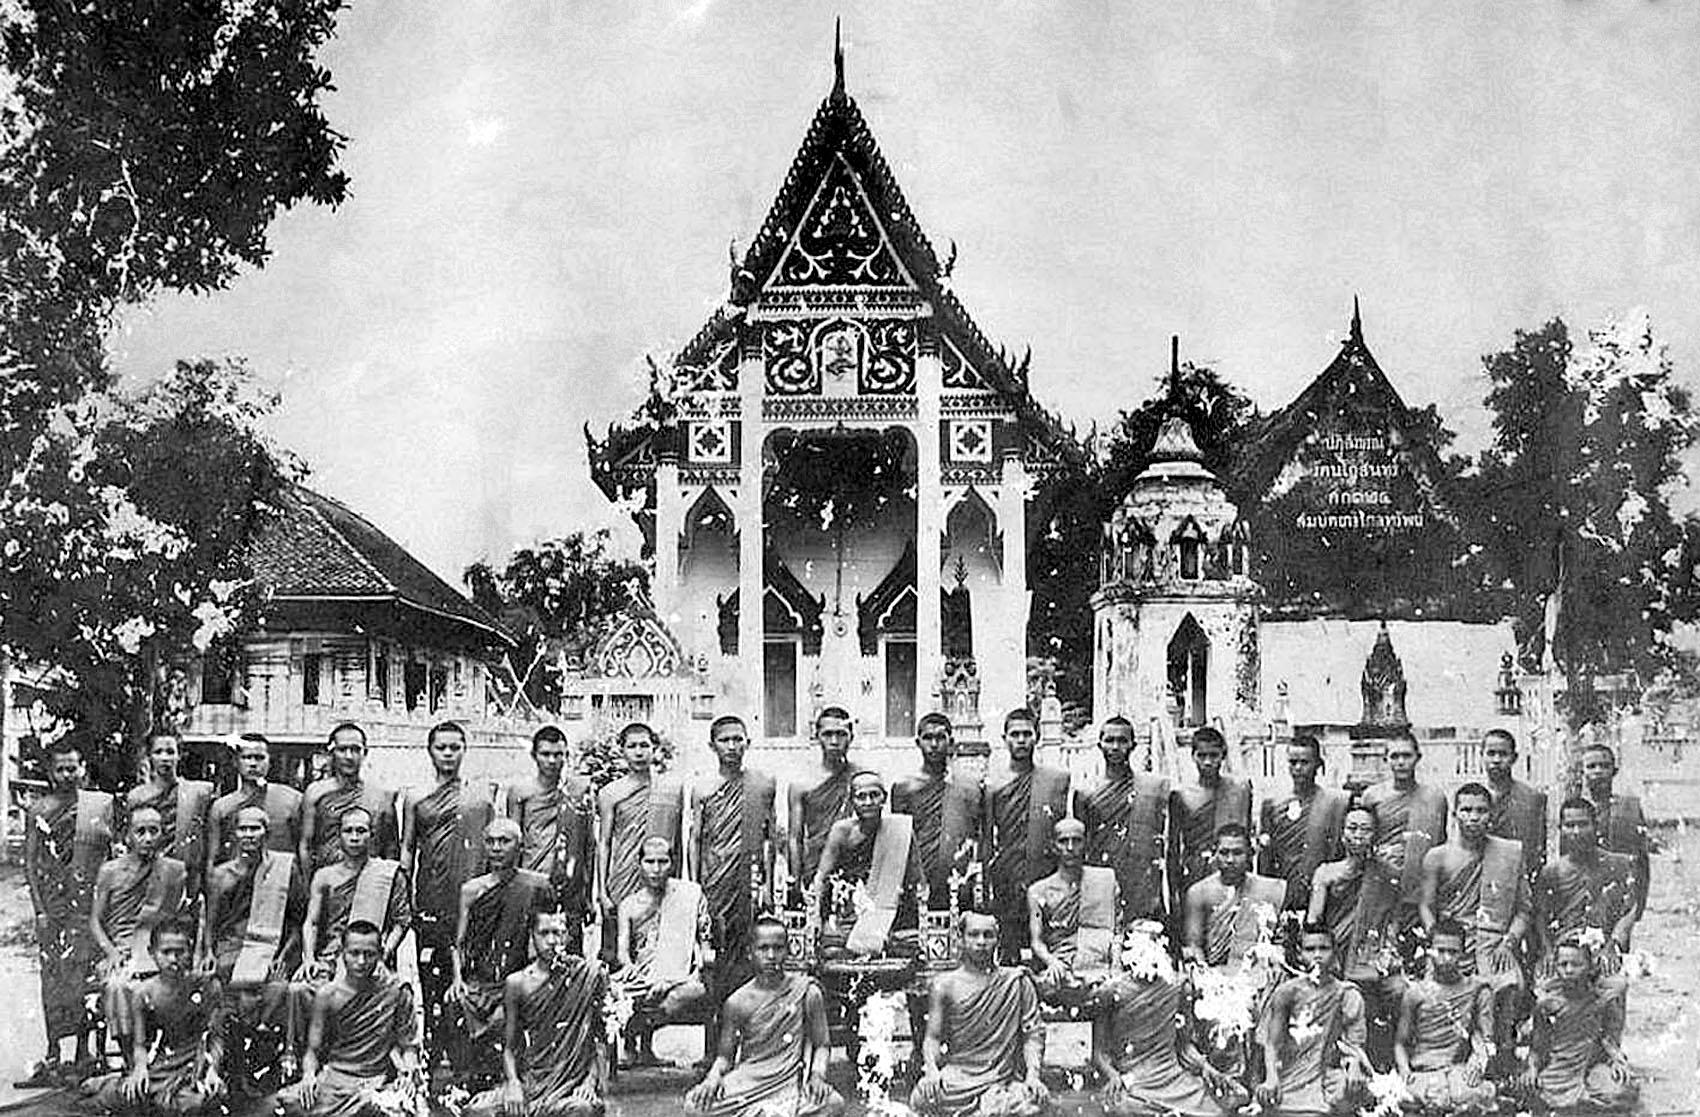 1909 Lopburi monks posing at Wat Phra Dhammasopon.jpg